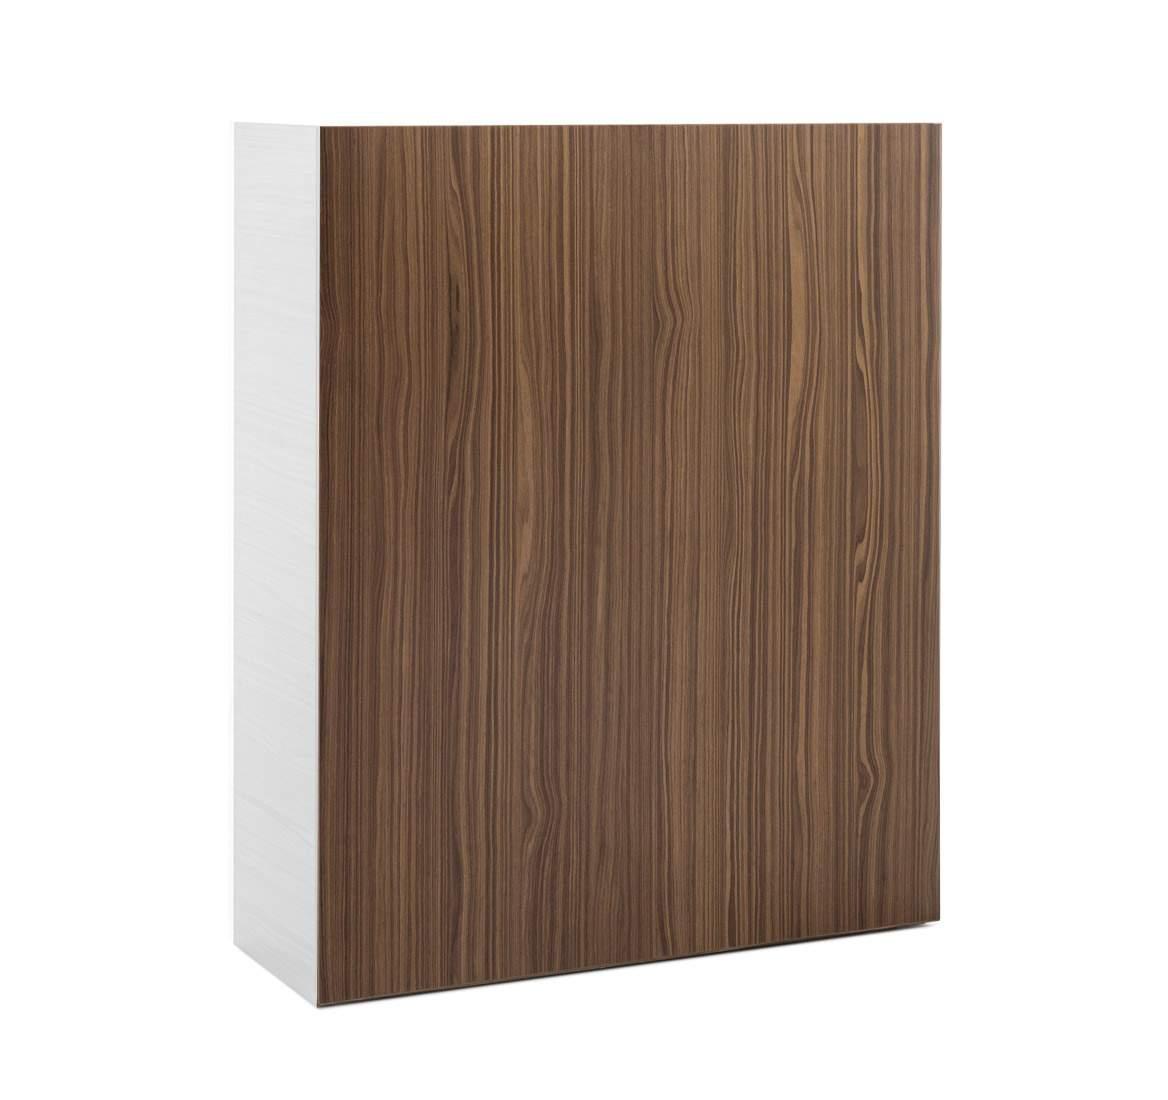 KYO Задняя стенка шкафа 1200x1500